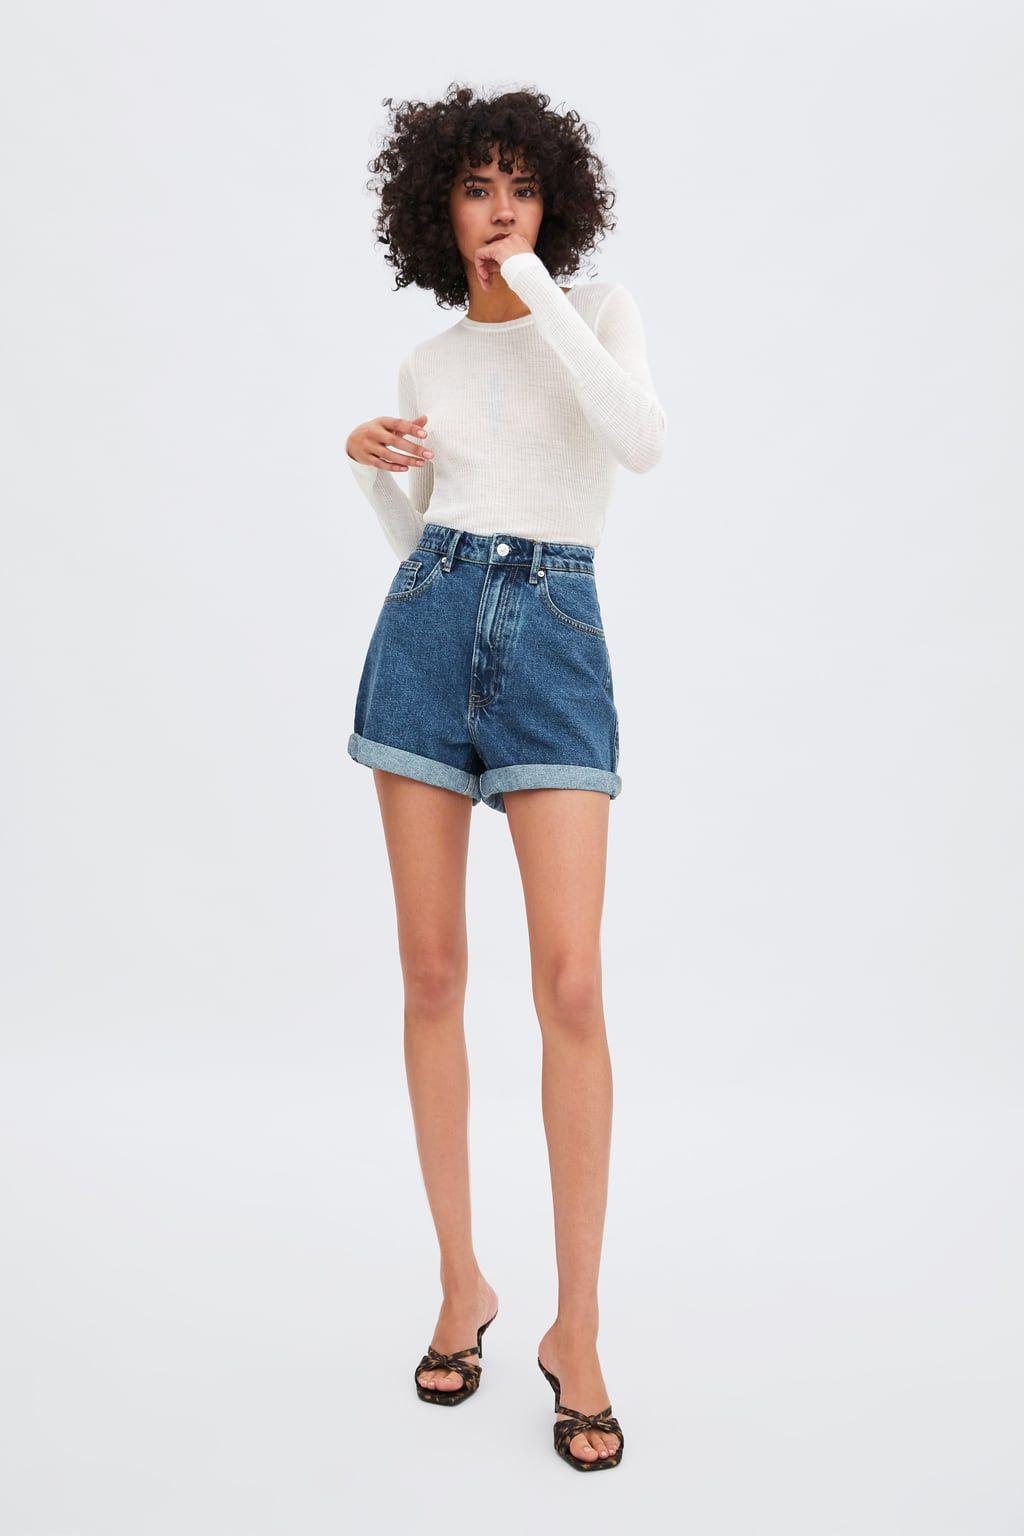 adc9da8703 BERMUDA MOM FIT AUTHENTIC DENIM in 2019 | Wearables | Mom jeans ...